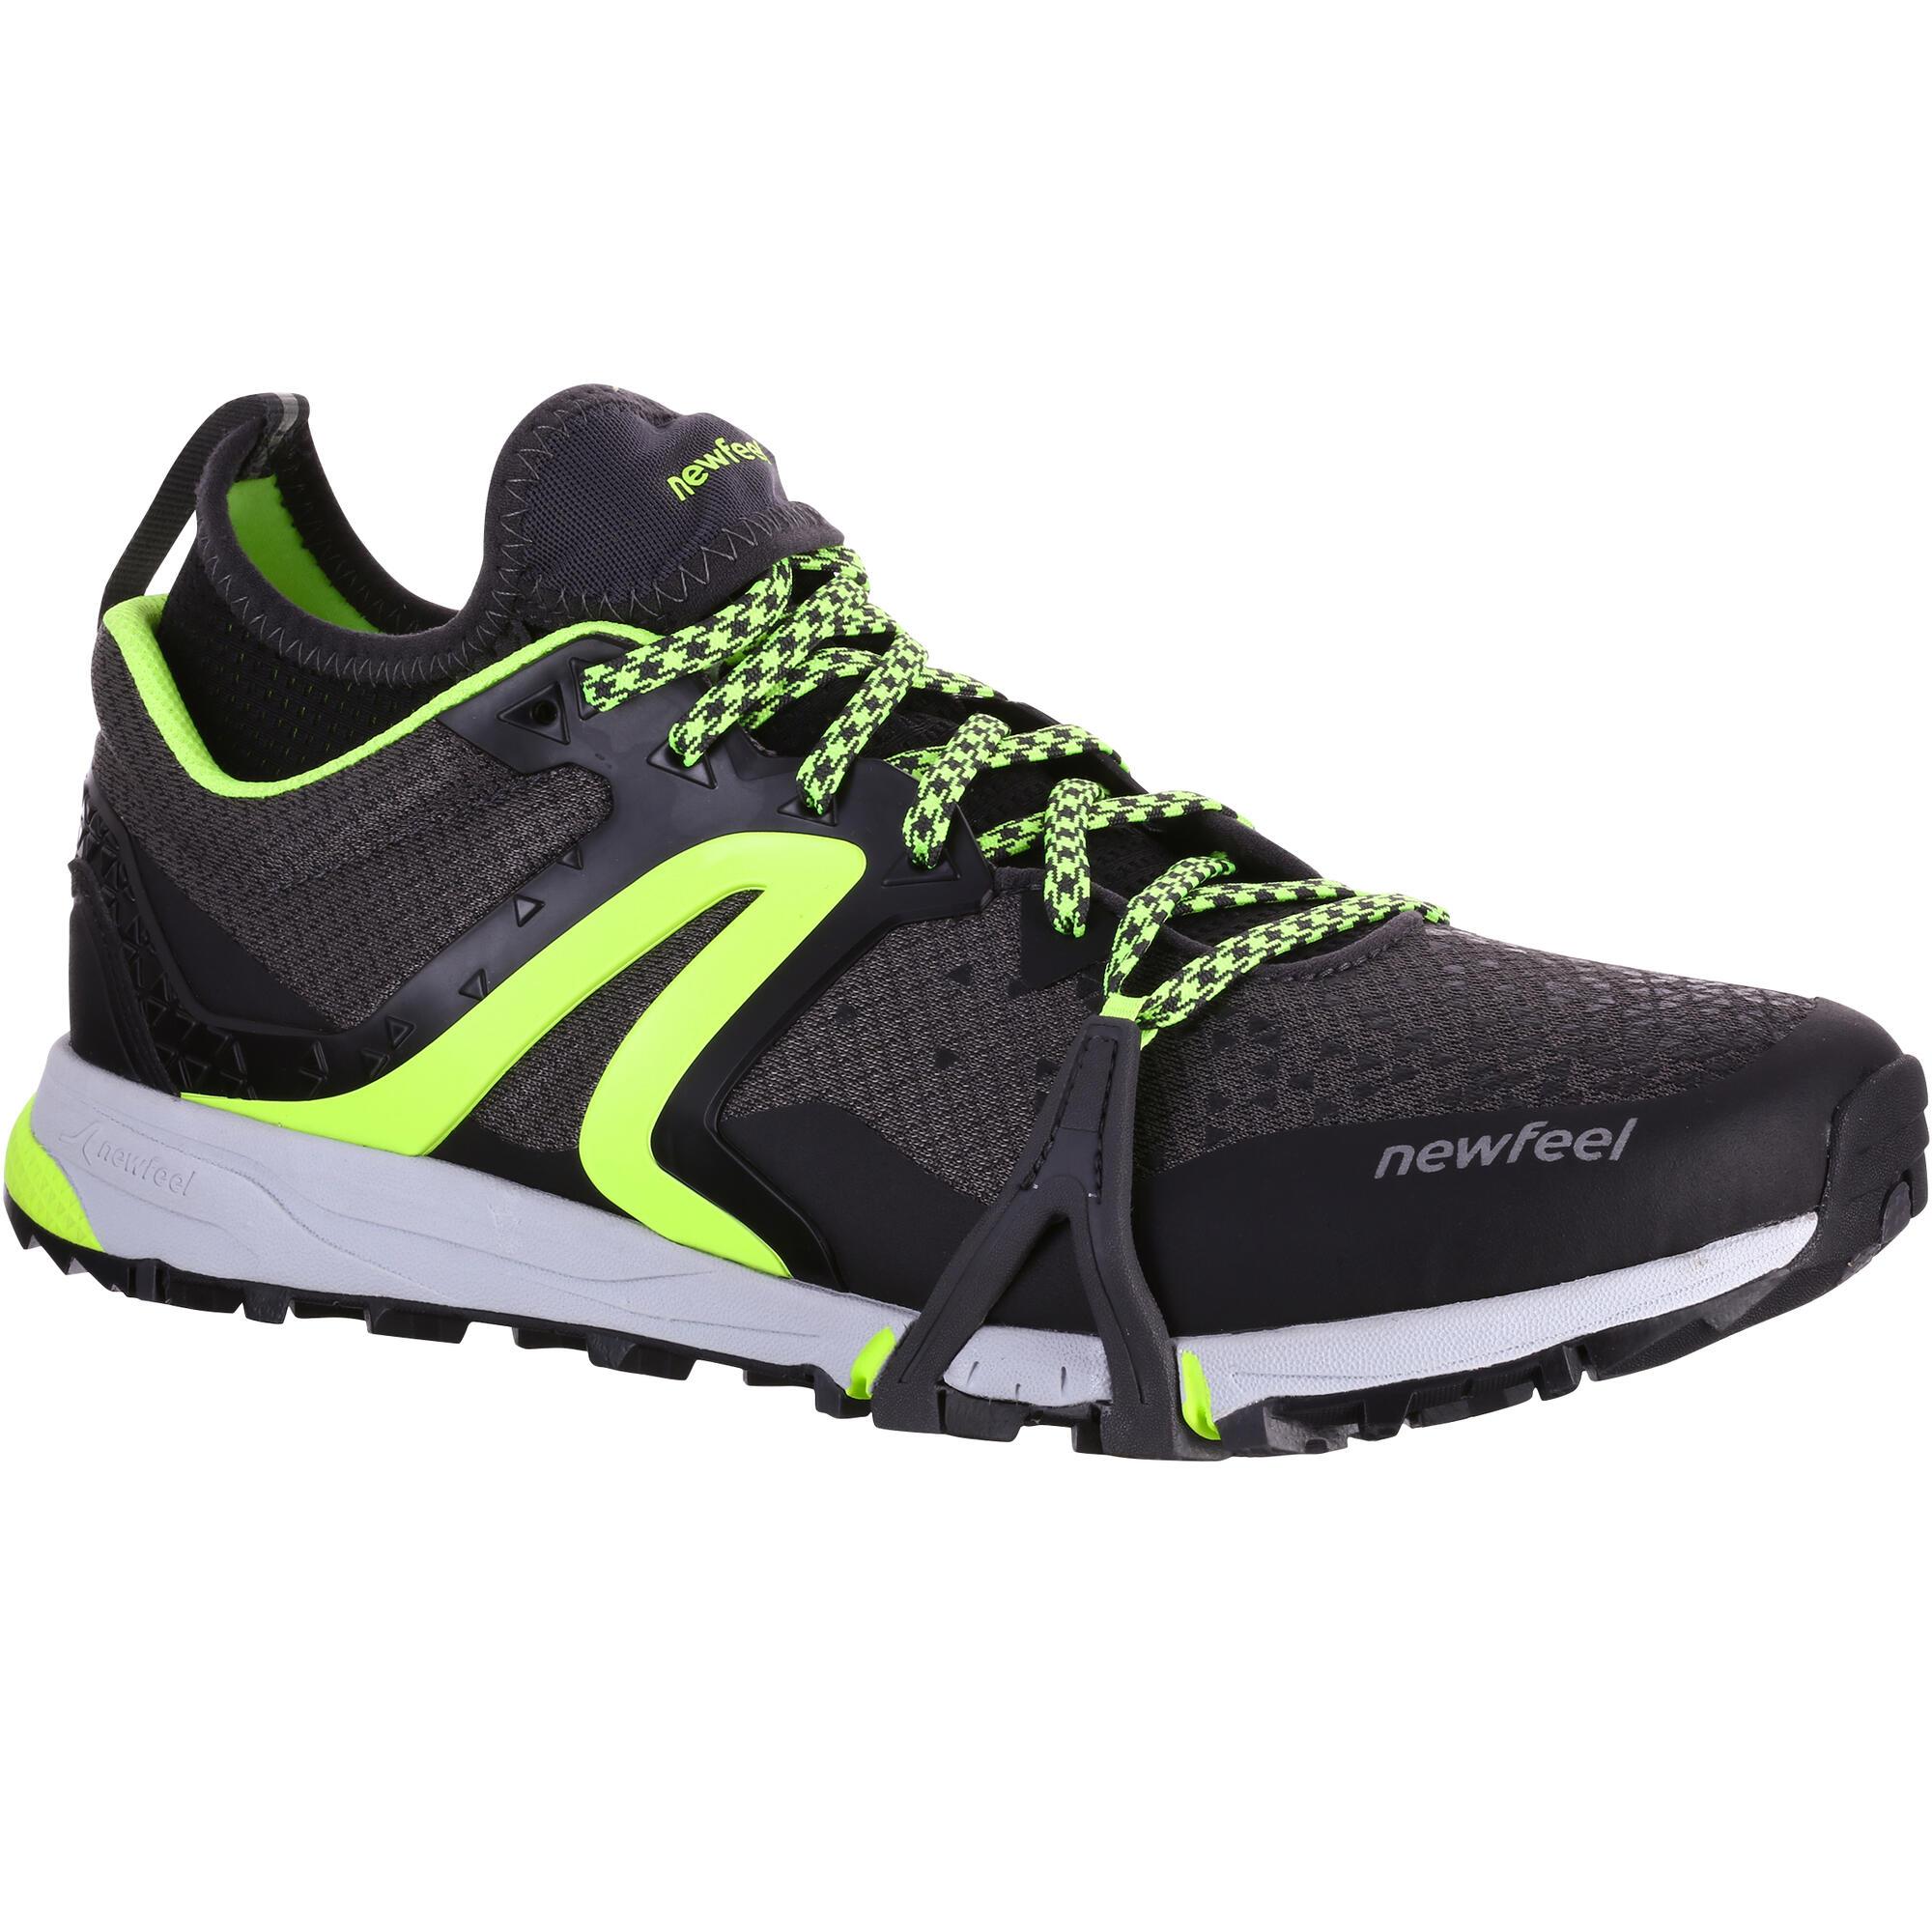 Nordic Walk 900 men's Nordic walking shoes black/green ...